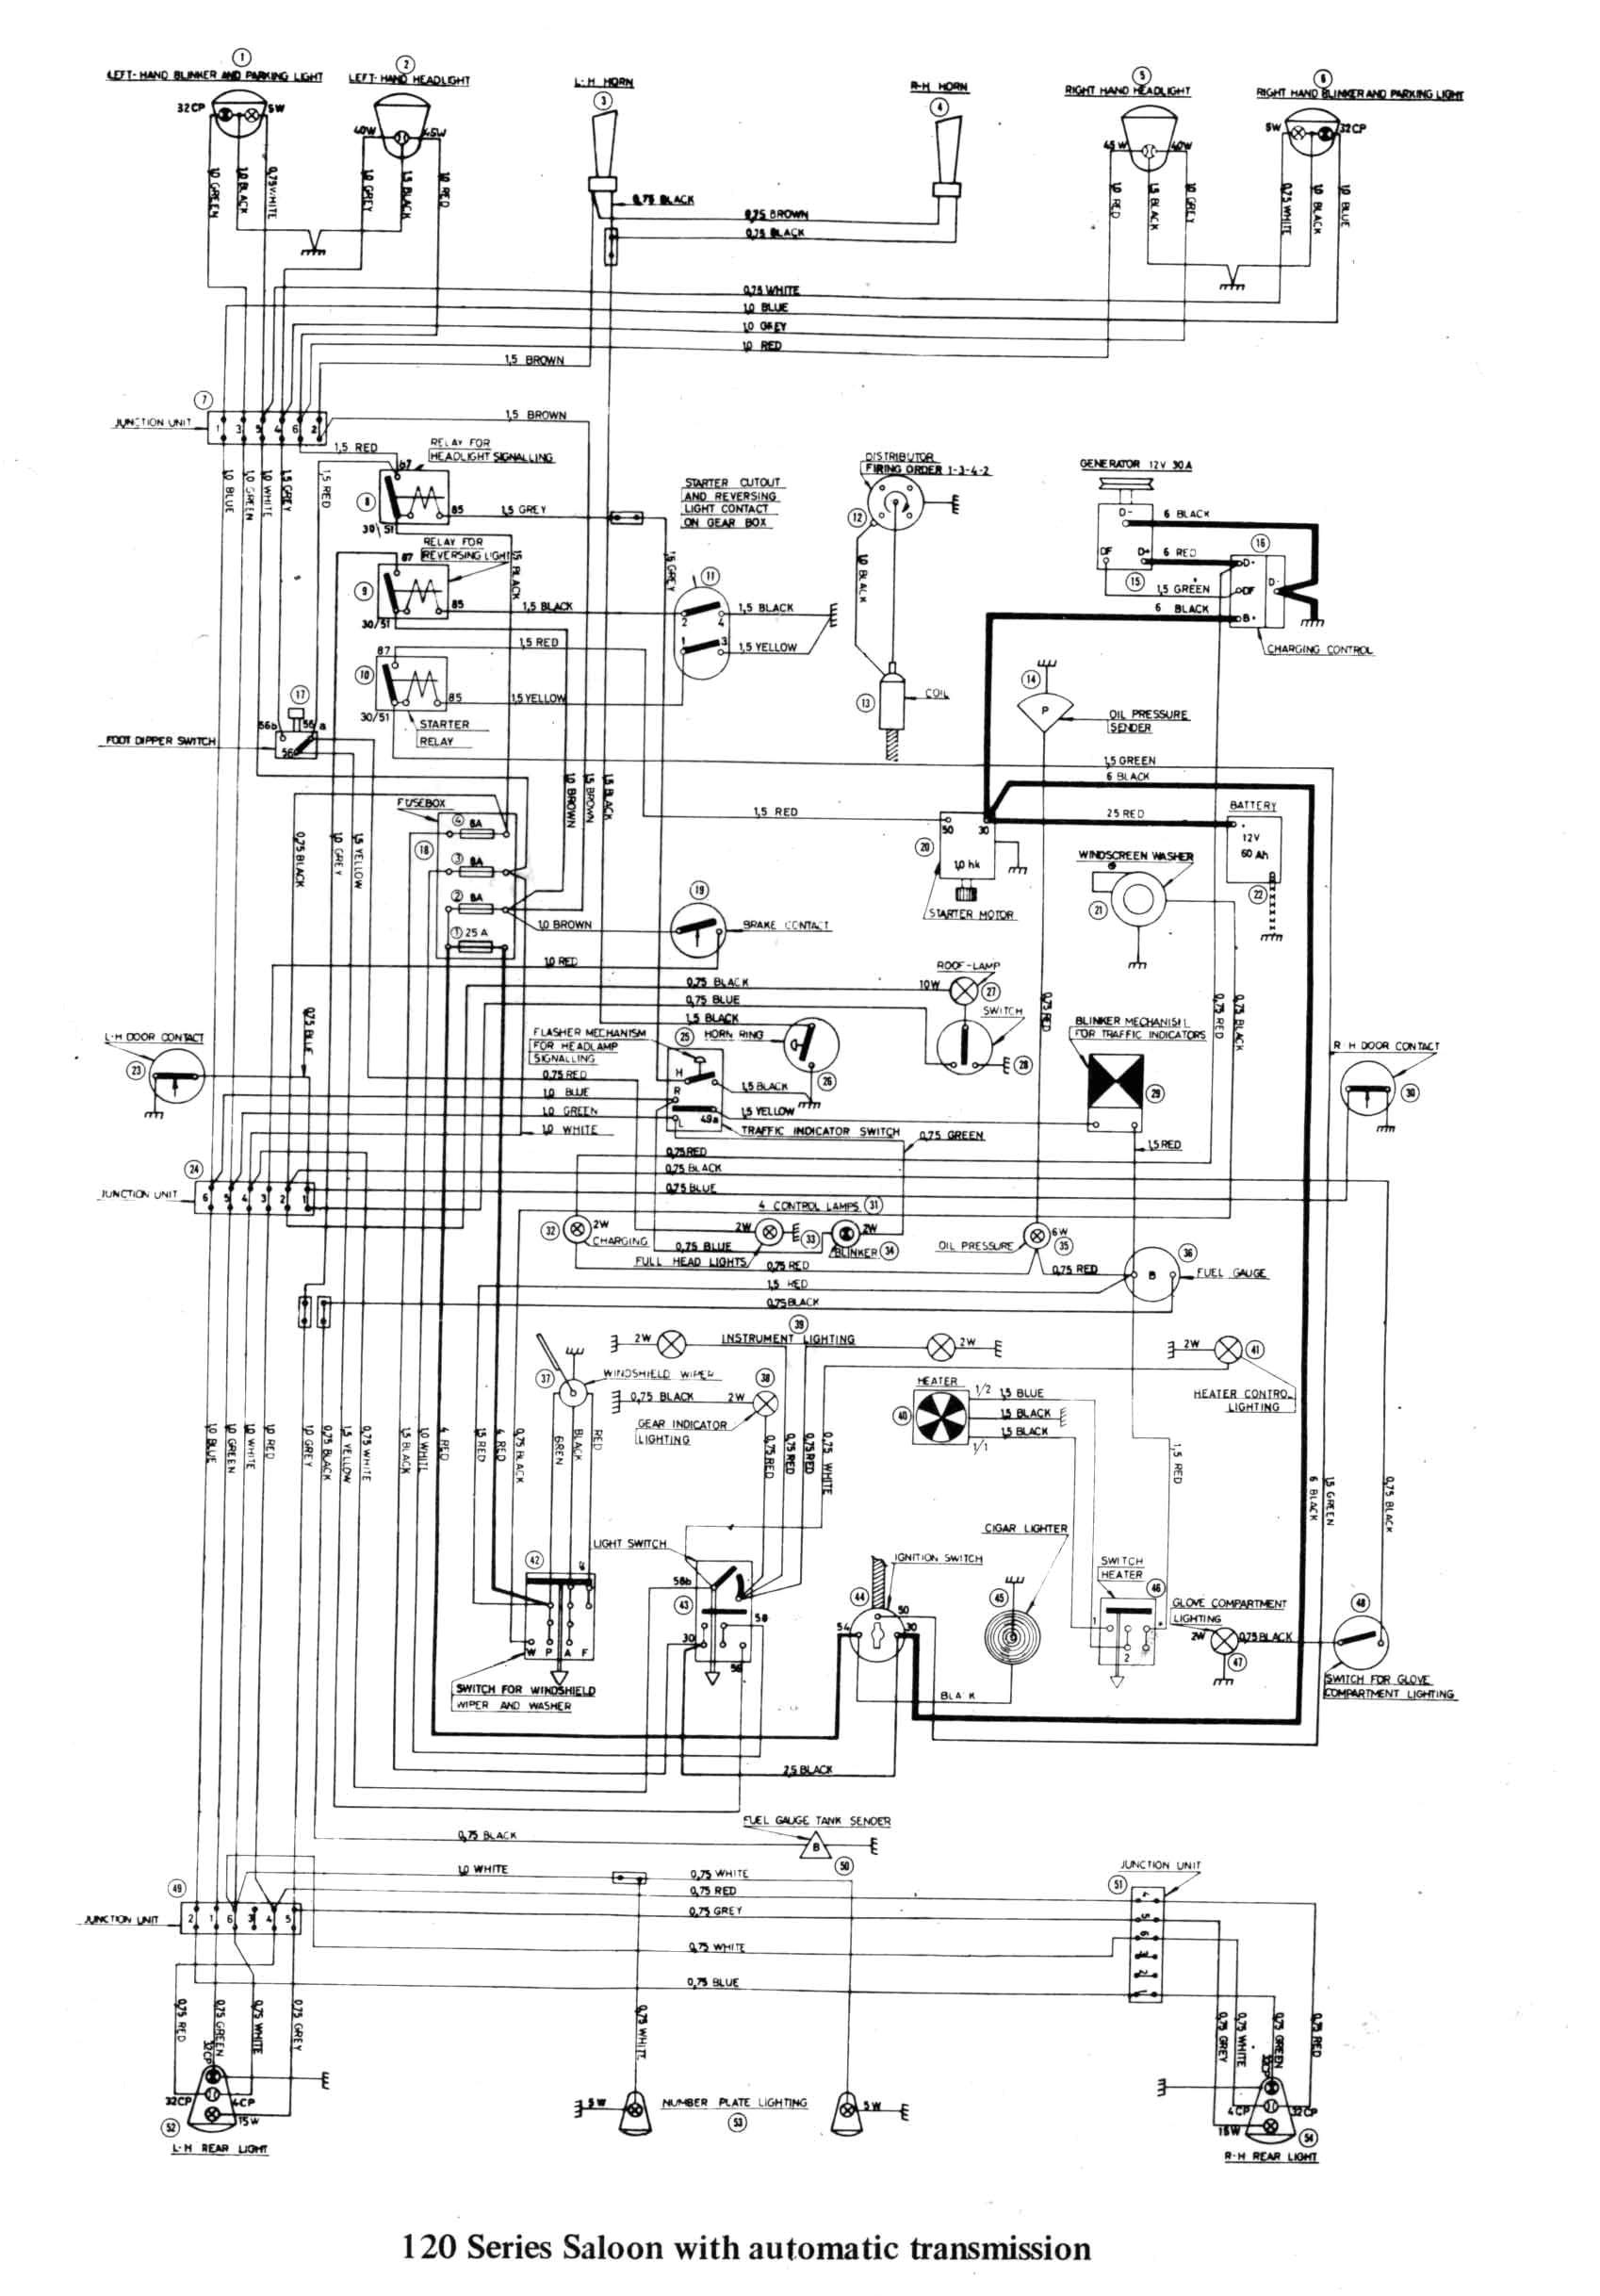 2010 polaris lx 600 wiring diagram wiring diagram review beede wiring diagrams 946200